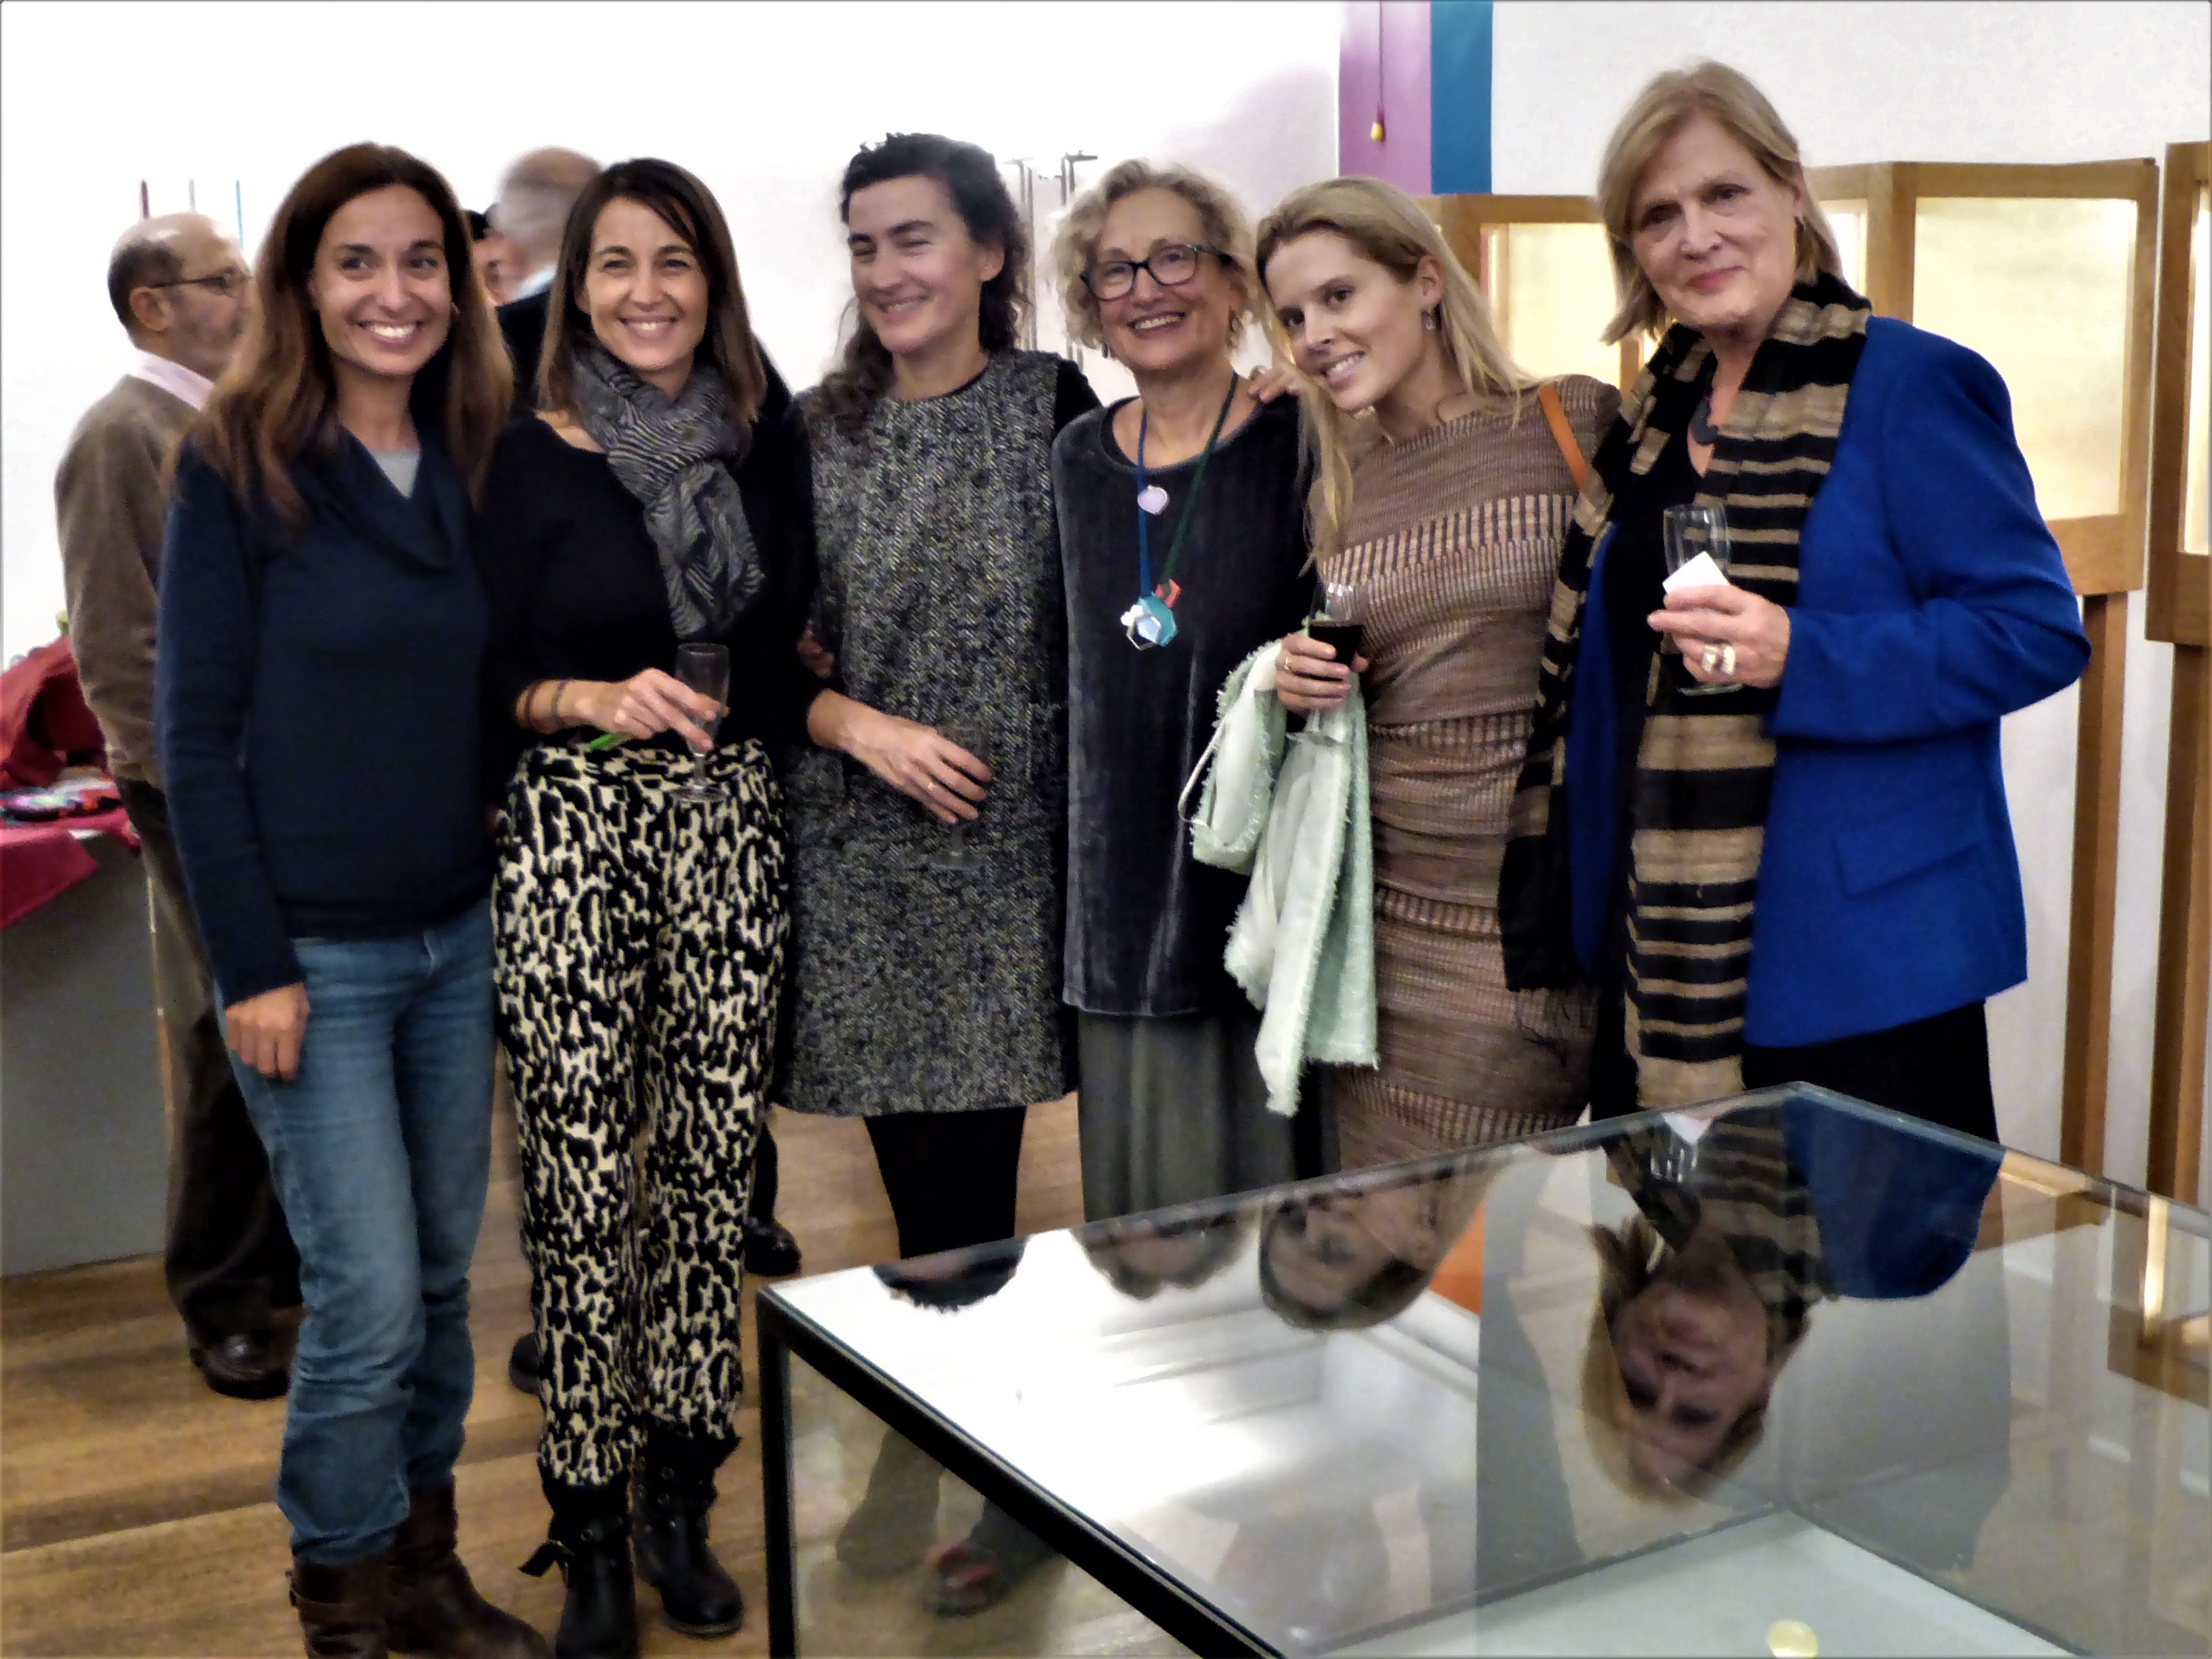 Opening in Galeria Reverso, Lissabon, geheel rechts Suzanne Esser, derde van rechts Paula Crespo, portret